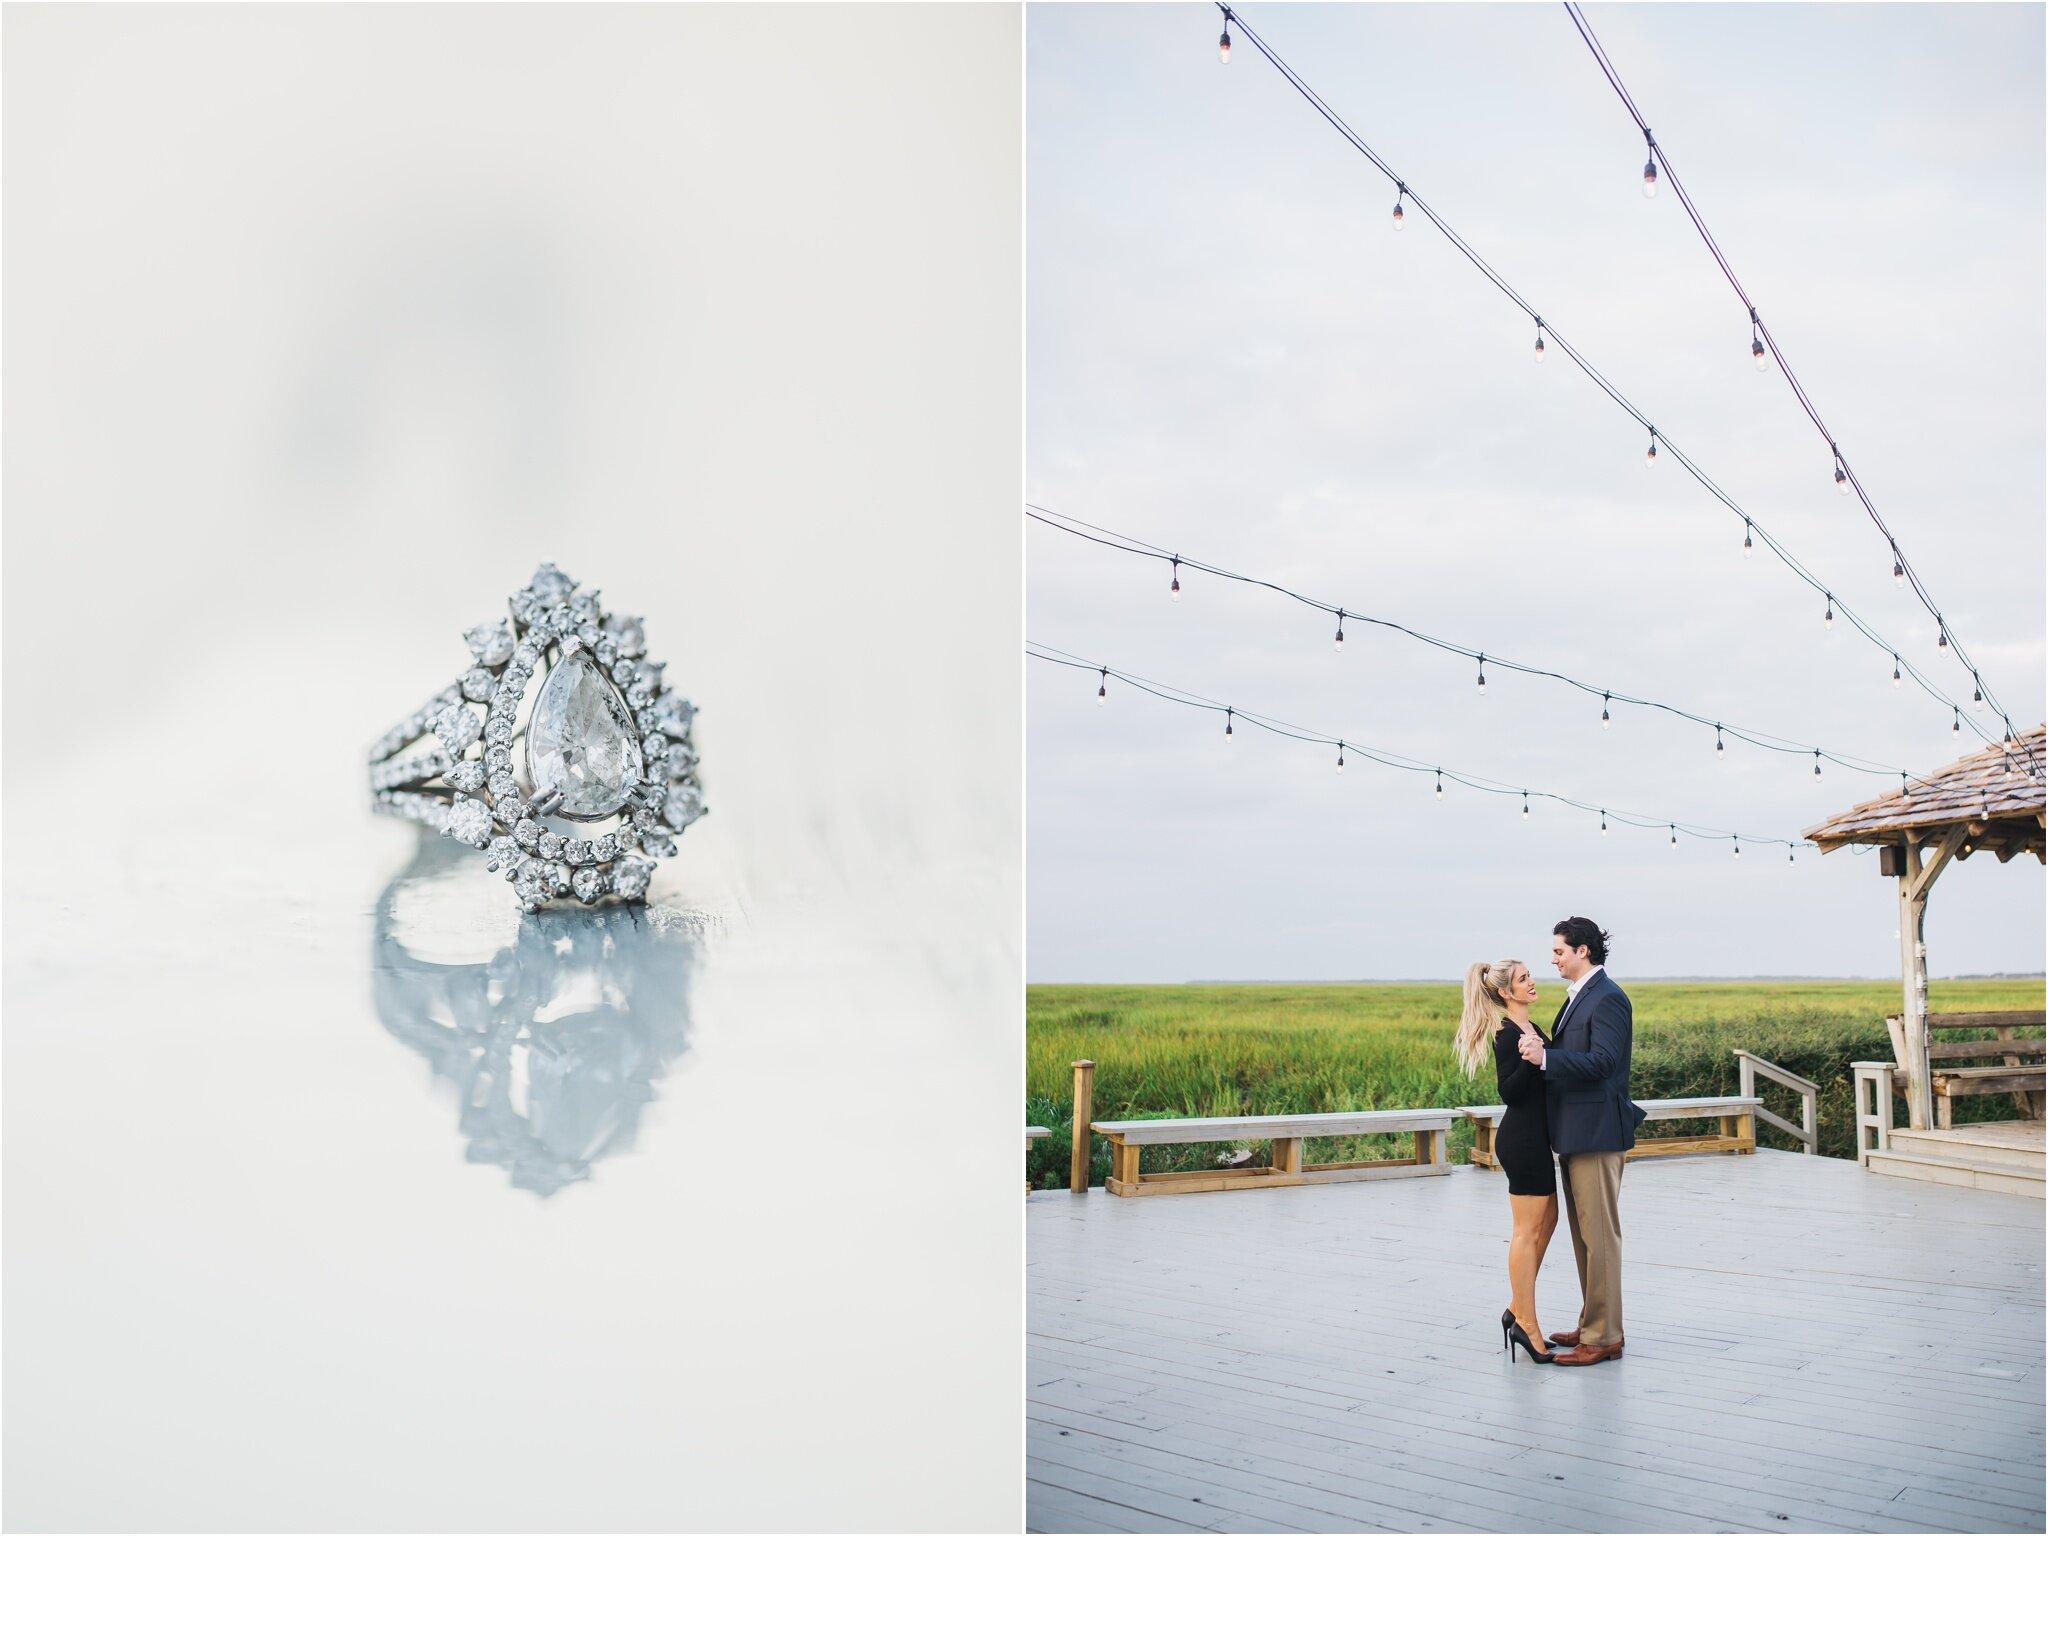 Rainey_Gregg_Photography_St._Simons_Island_Georgia_California_Wedding_Portrait_Photography_1833.jpg